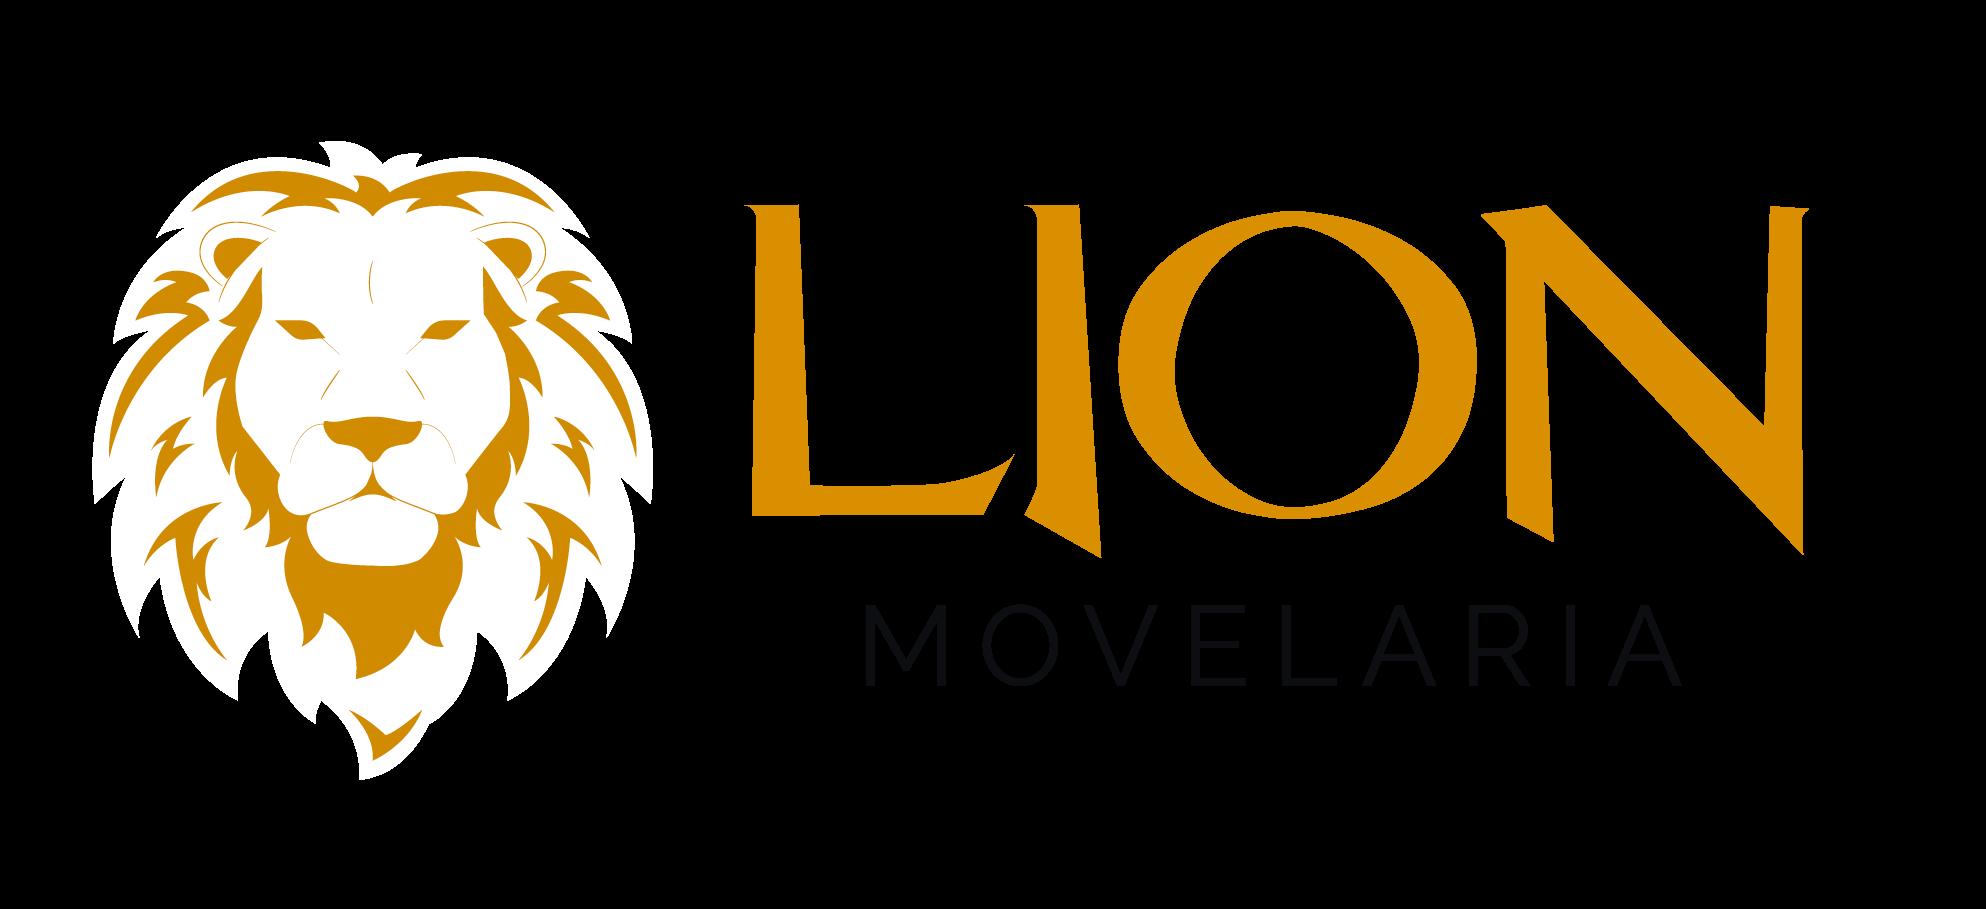 Lion Movelaria